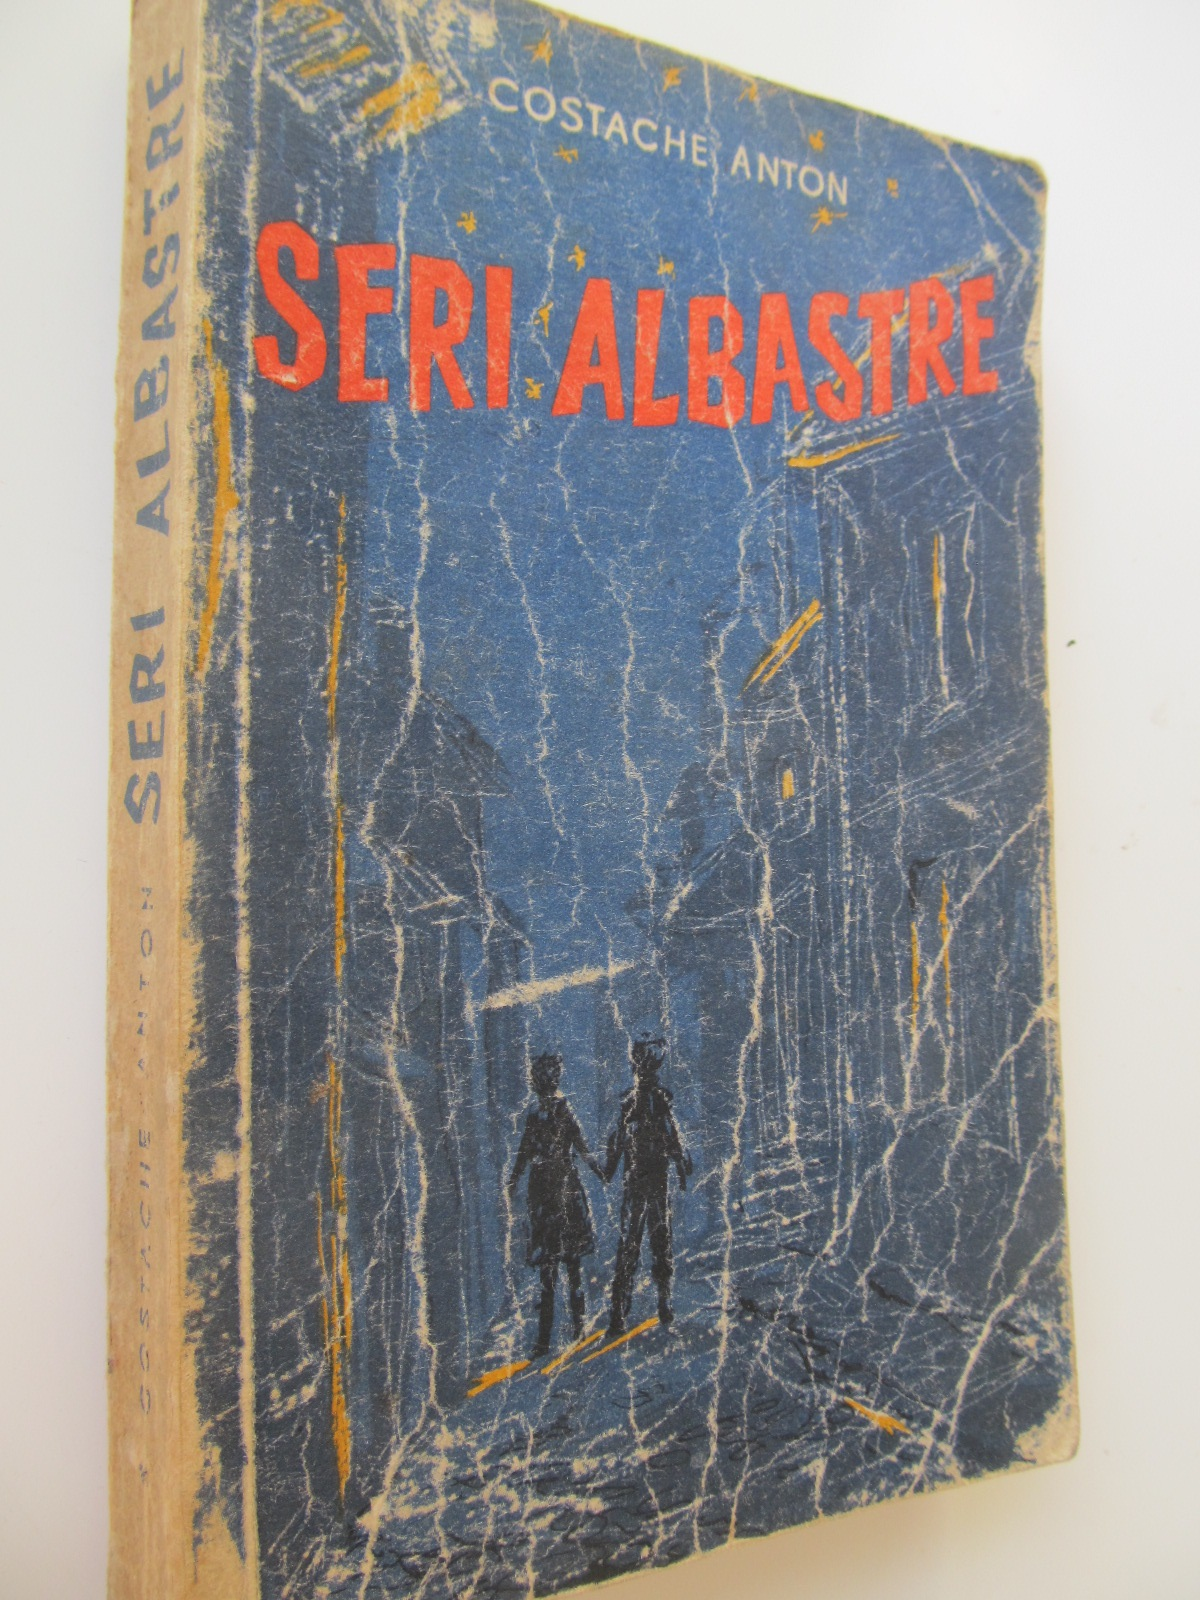 Seri albastre (vol. 1) - Costache Anton | Detalii carte